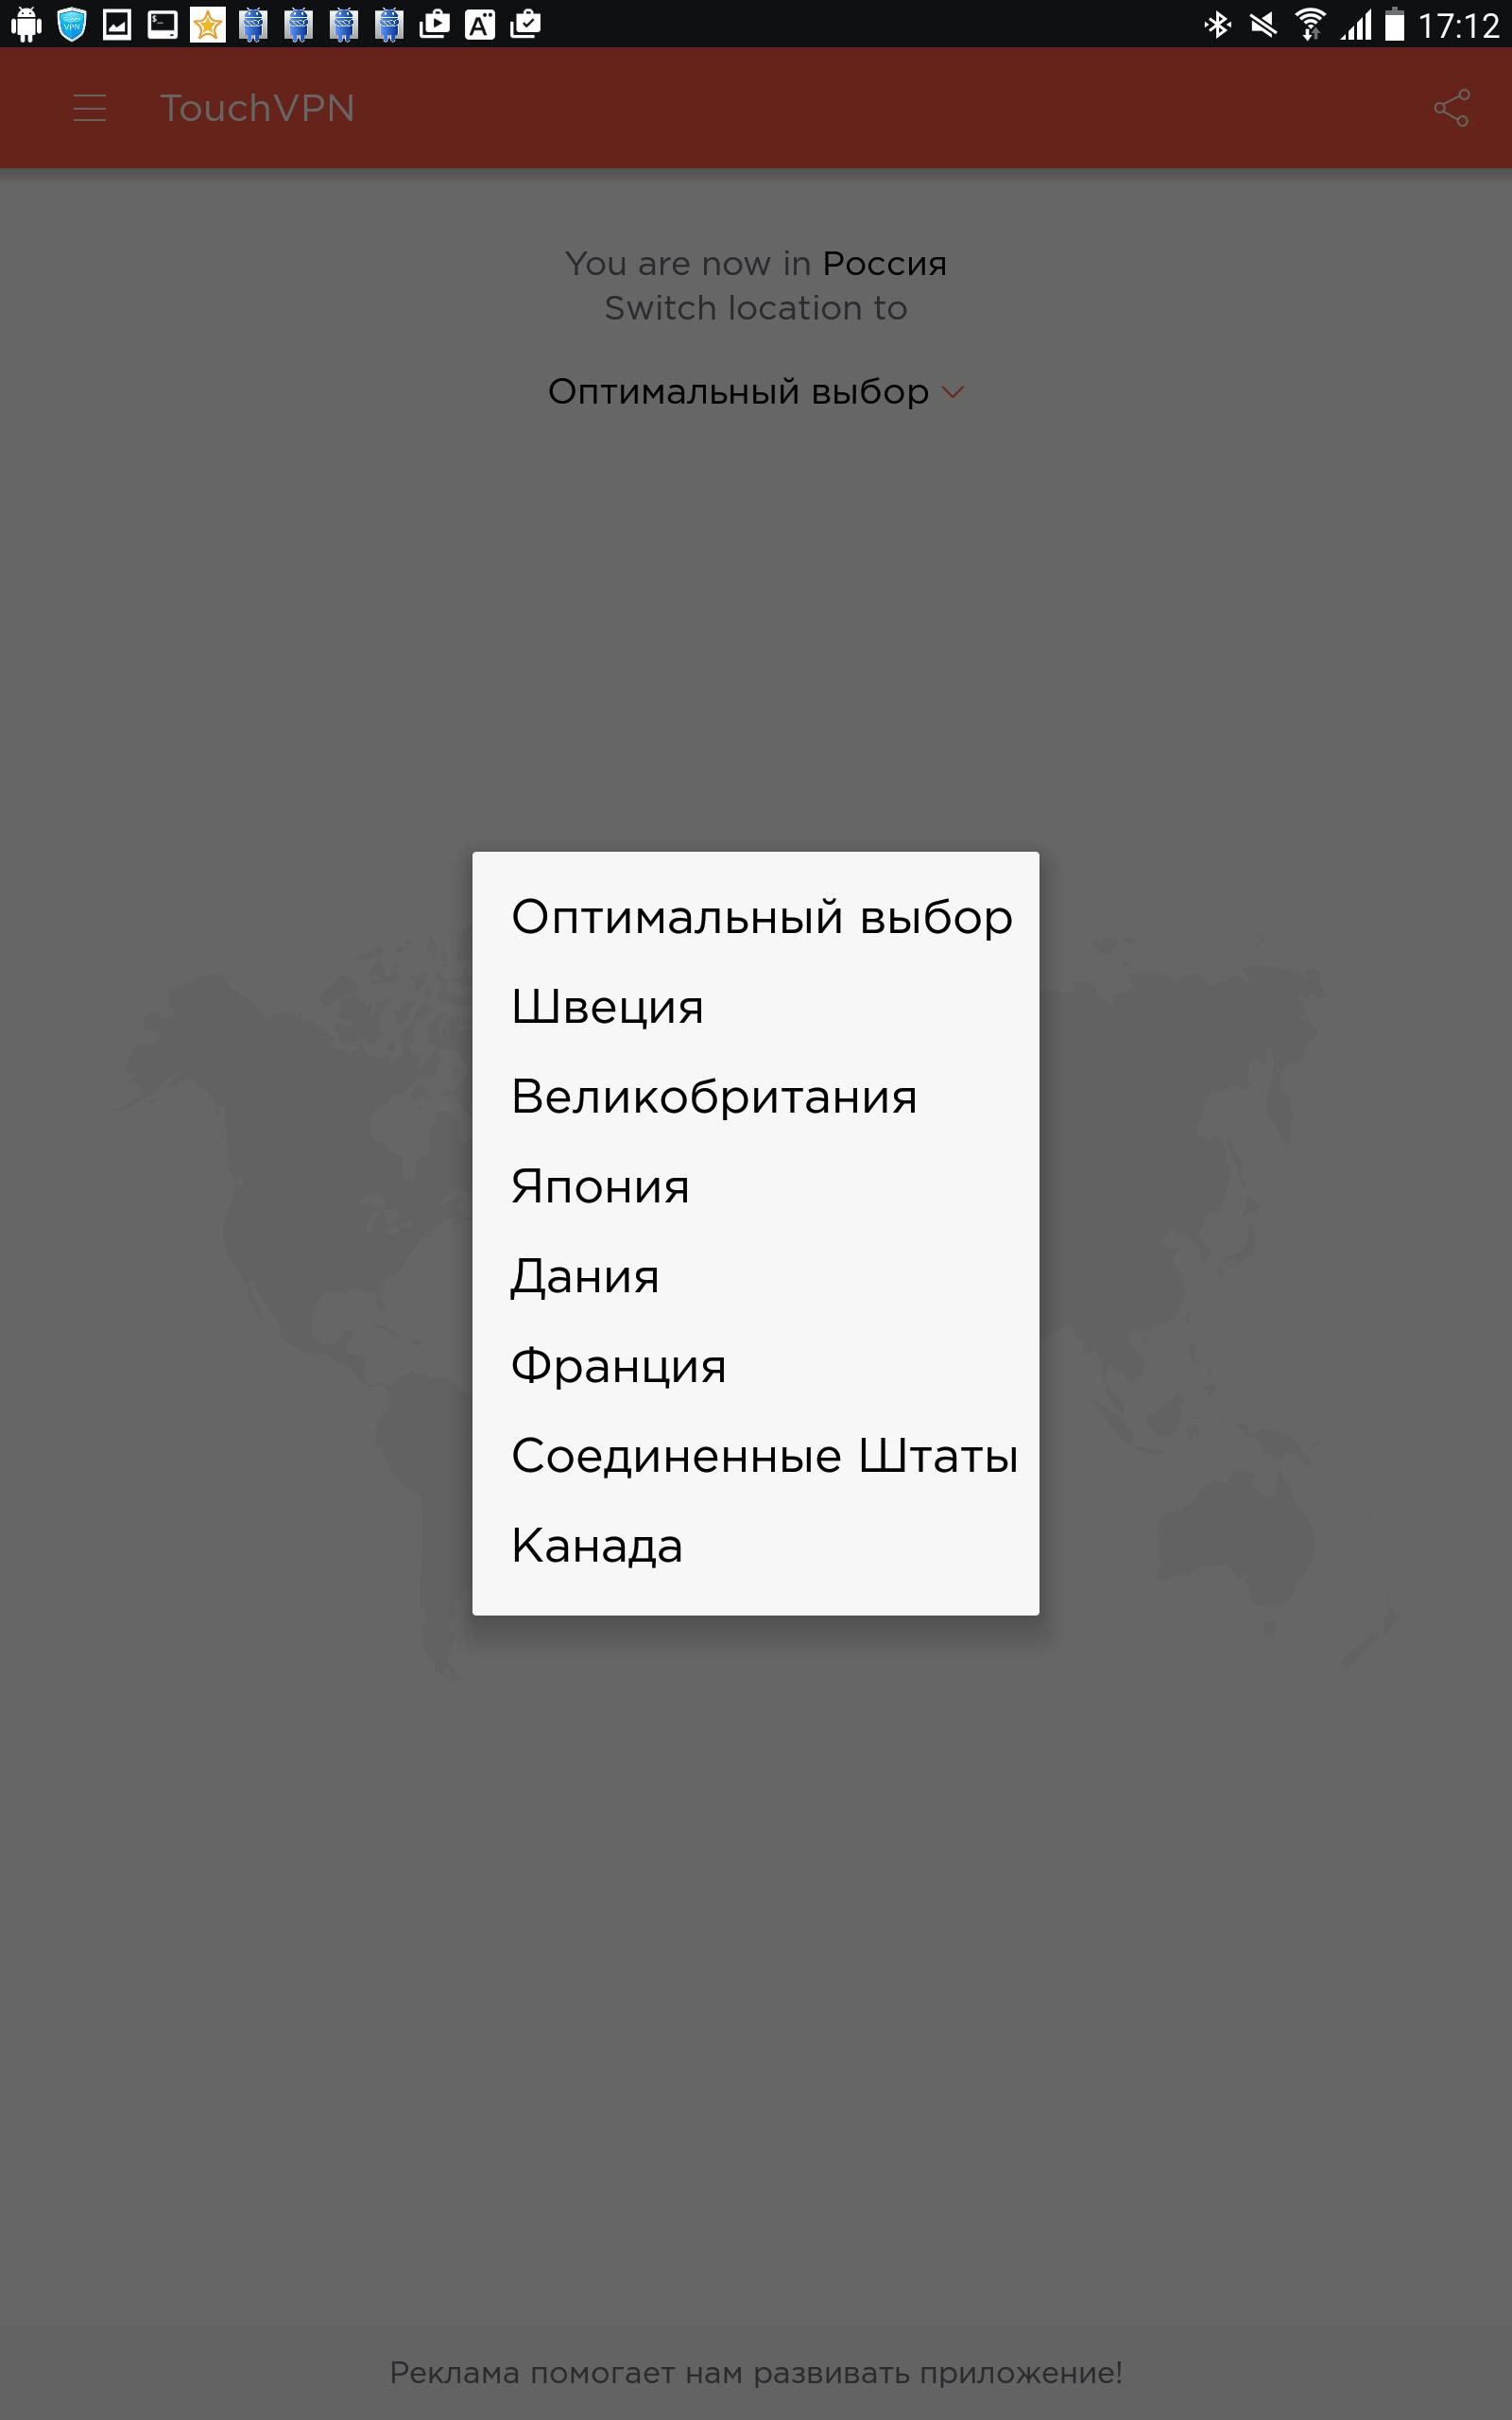 TouchVPN: выбор страны